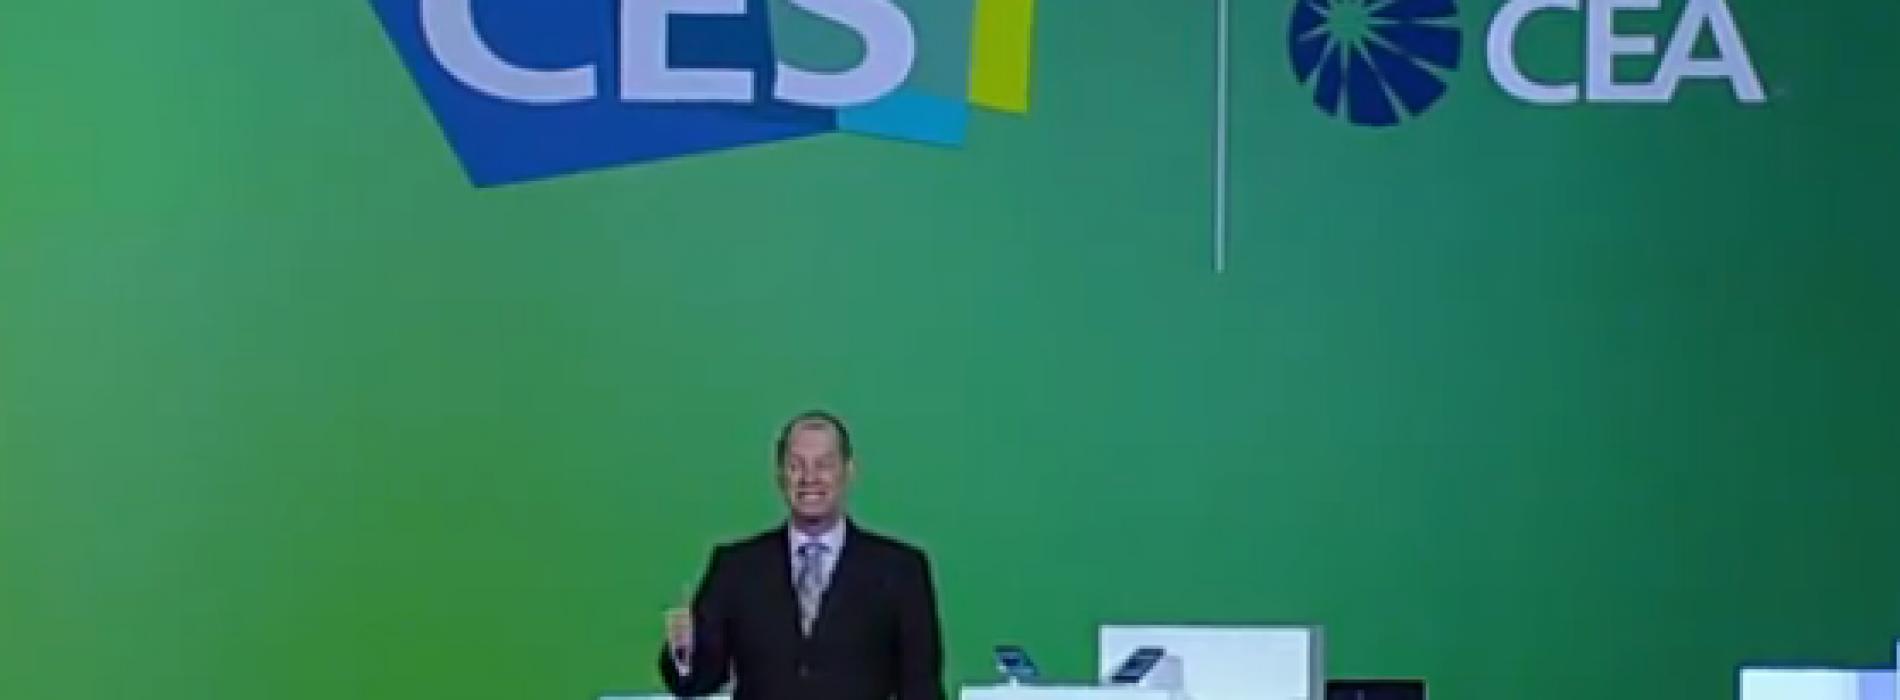 Watch Samsung's CES 2013 keynote in its entirety